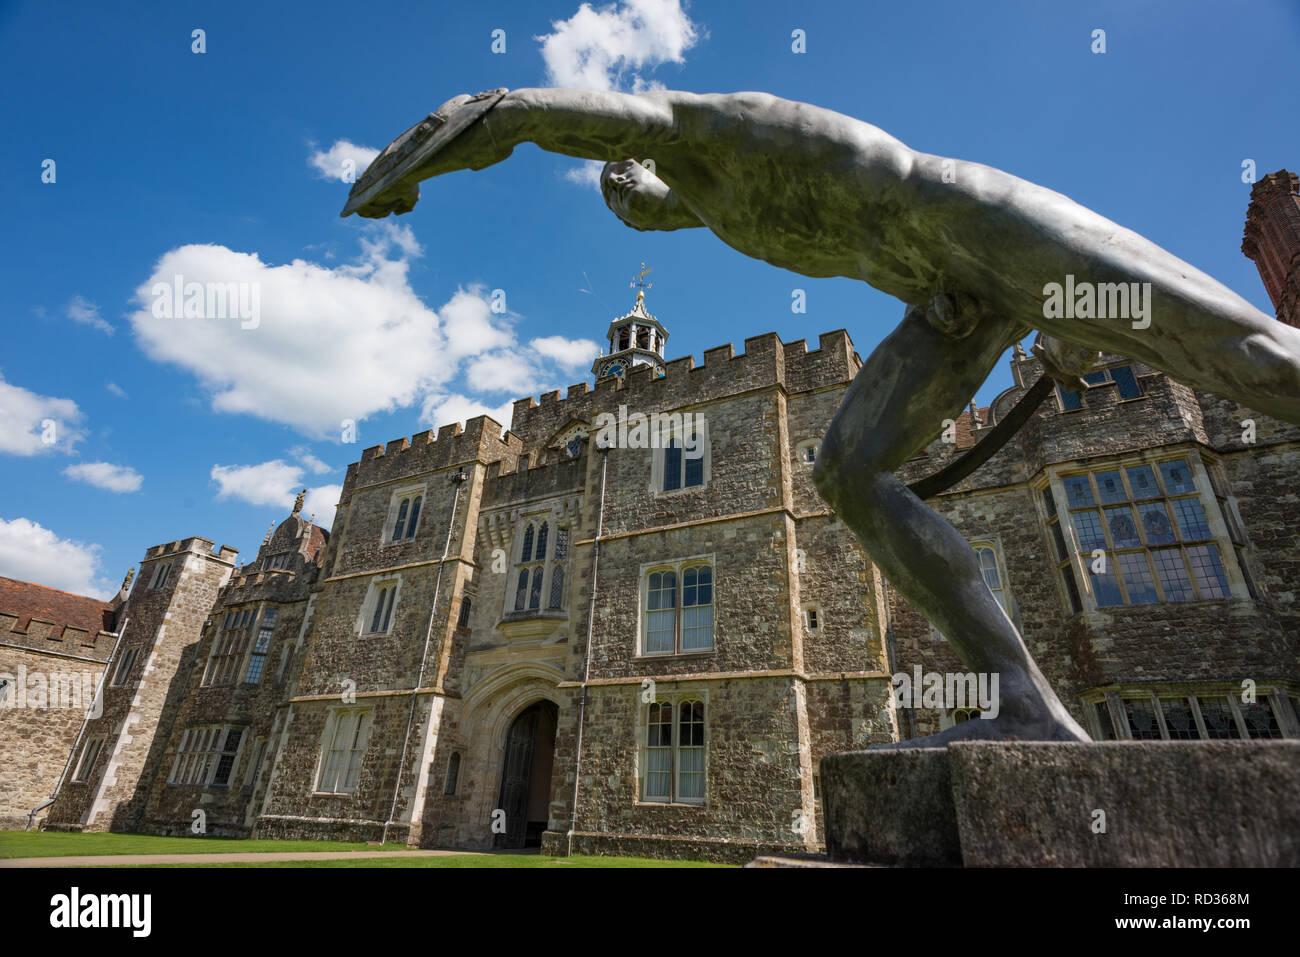 Knole Park house and gardens, Sevenoaks, Kent - Stock Image